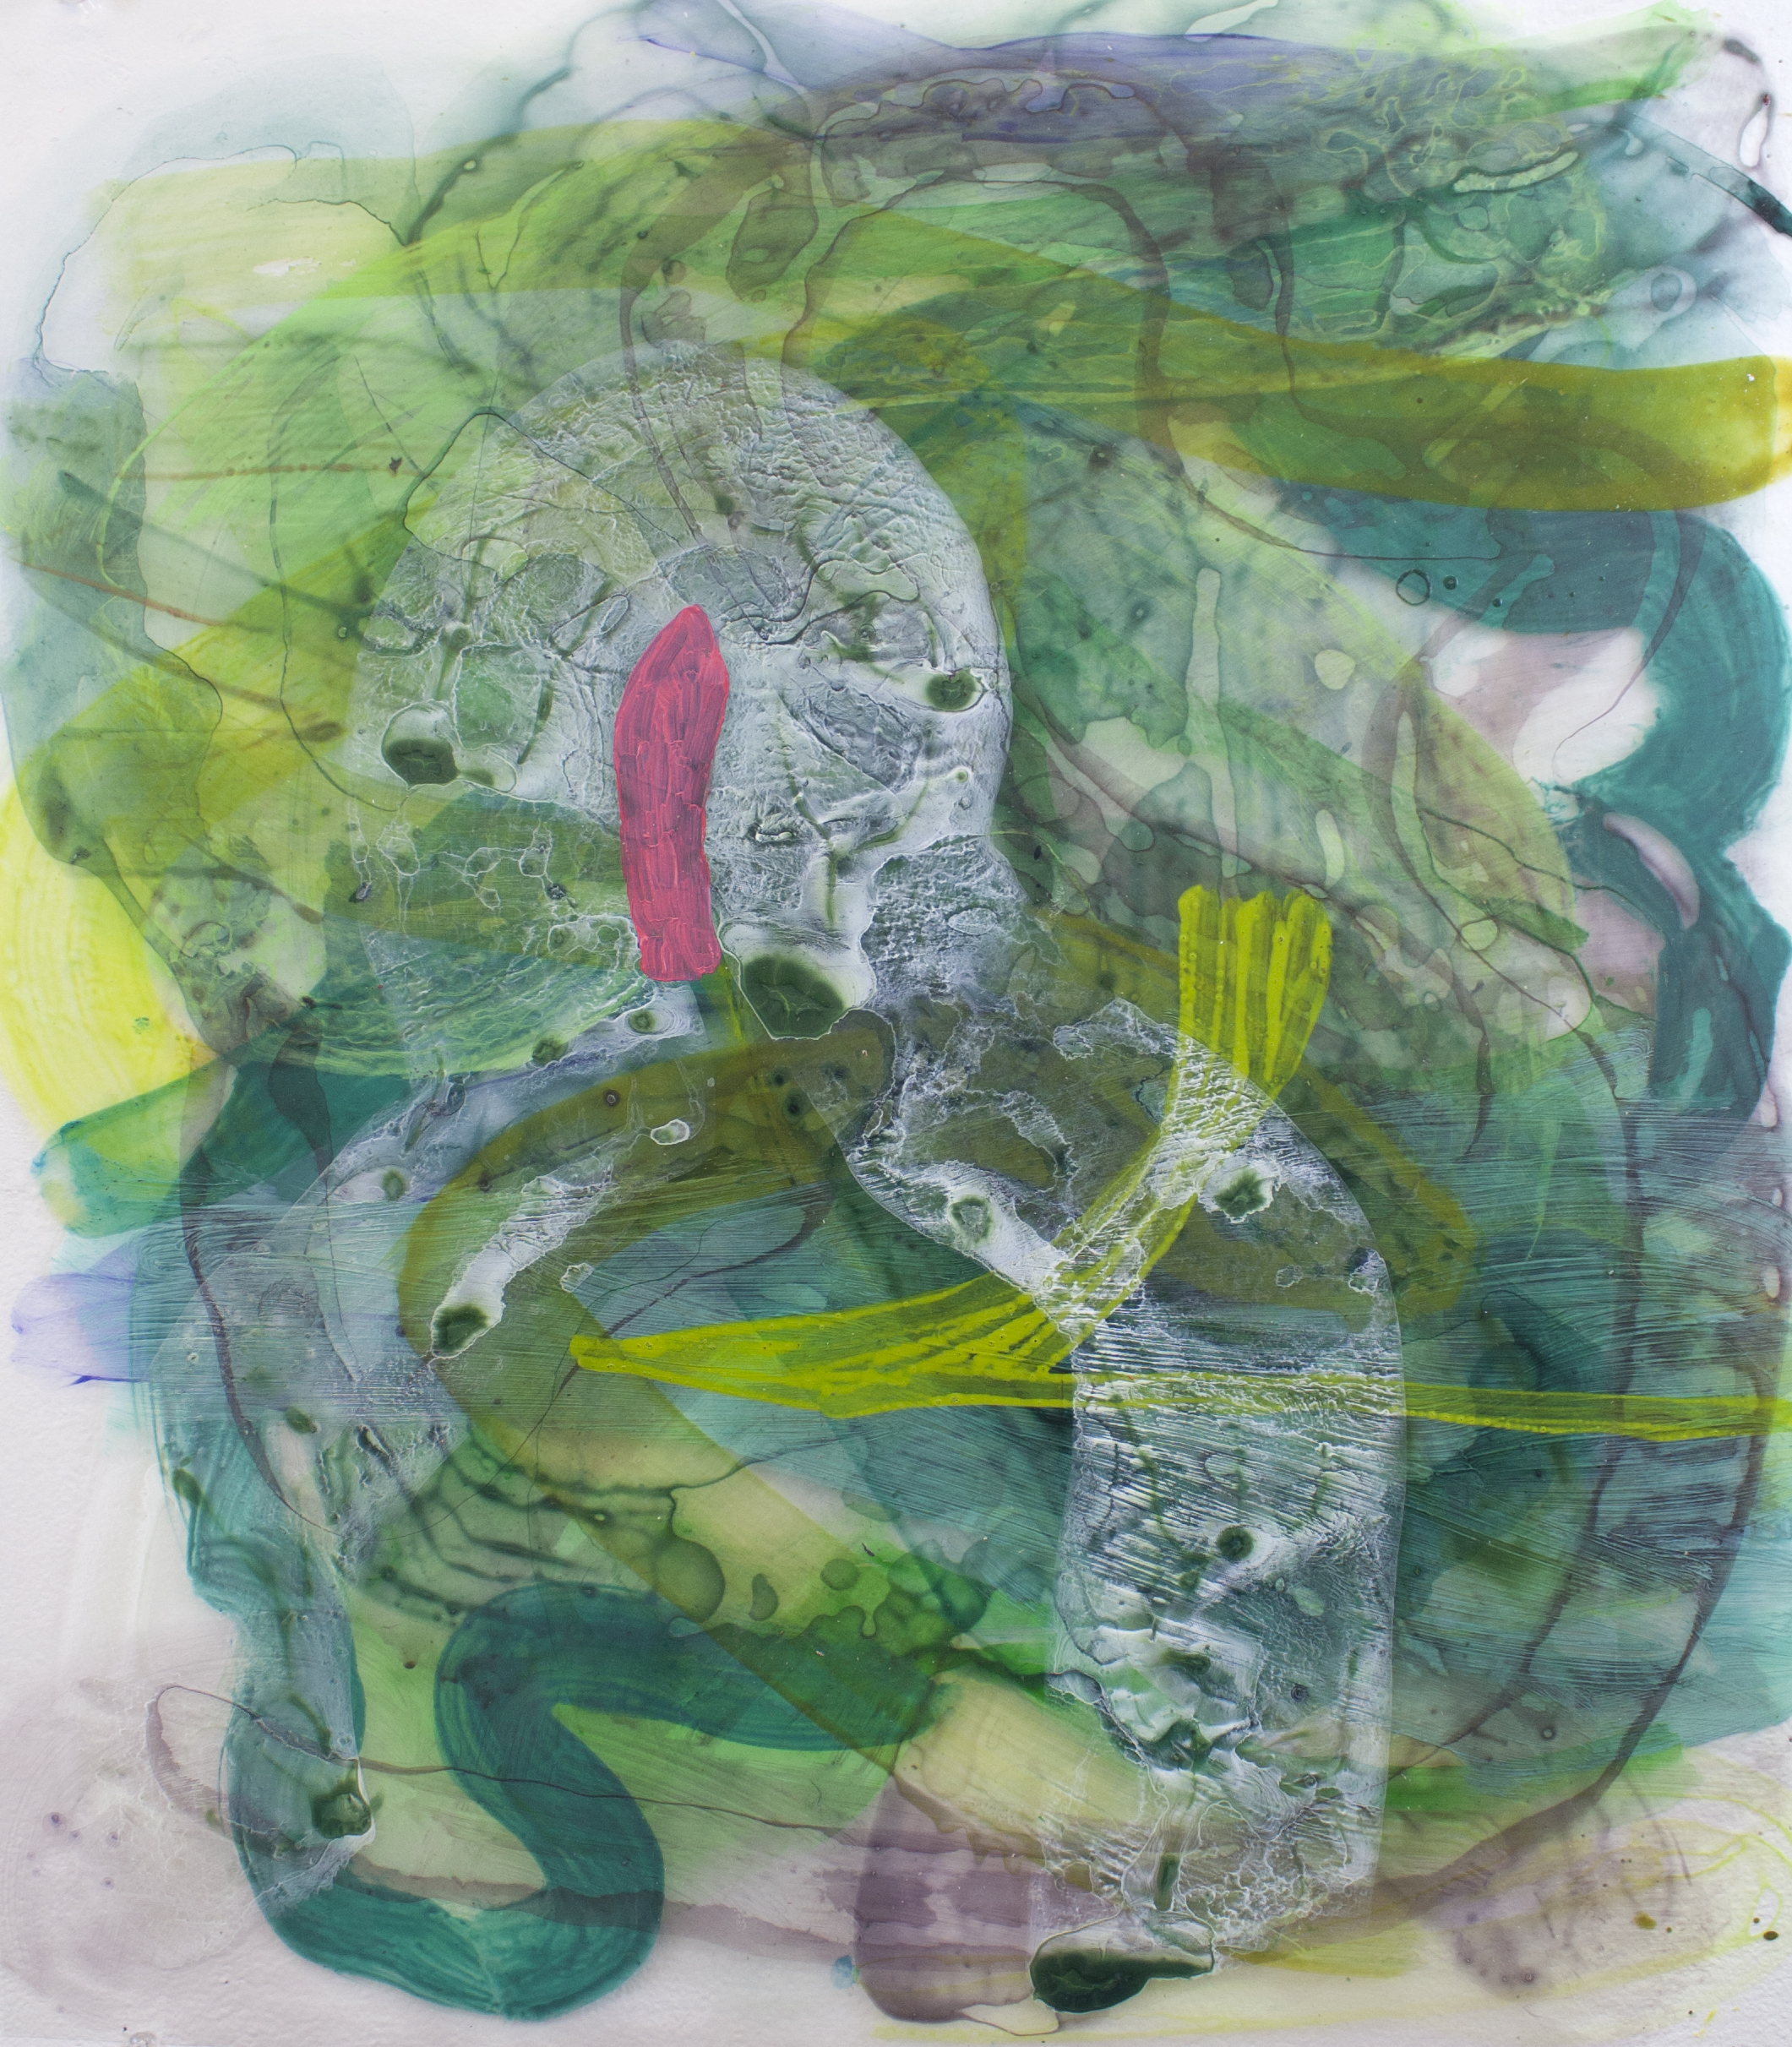 Grove Tight   2015  Acrylic on acetate  20x24 in